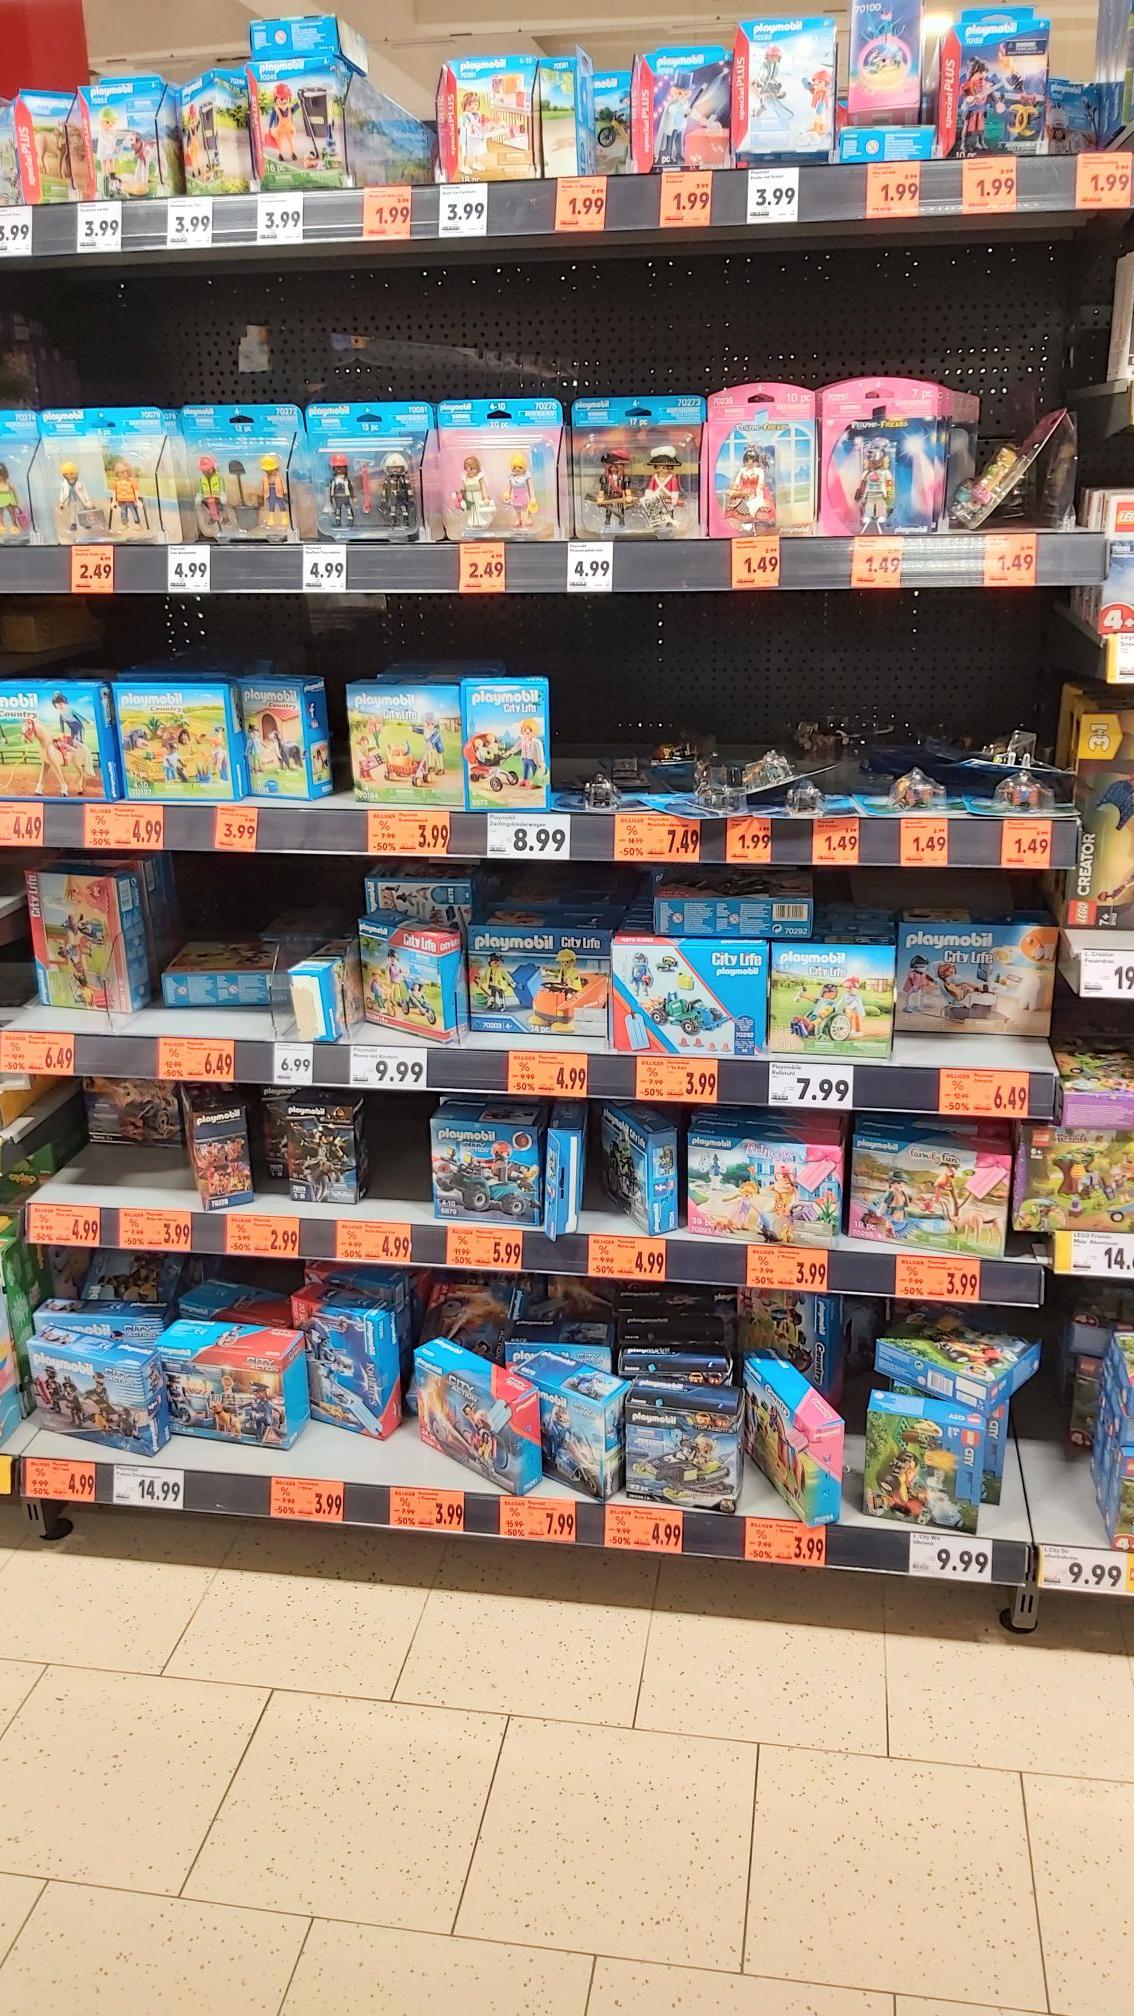 Kaufland Bad Saulgau: Playmobil zum halben Preis